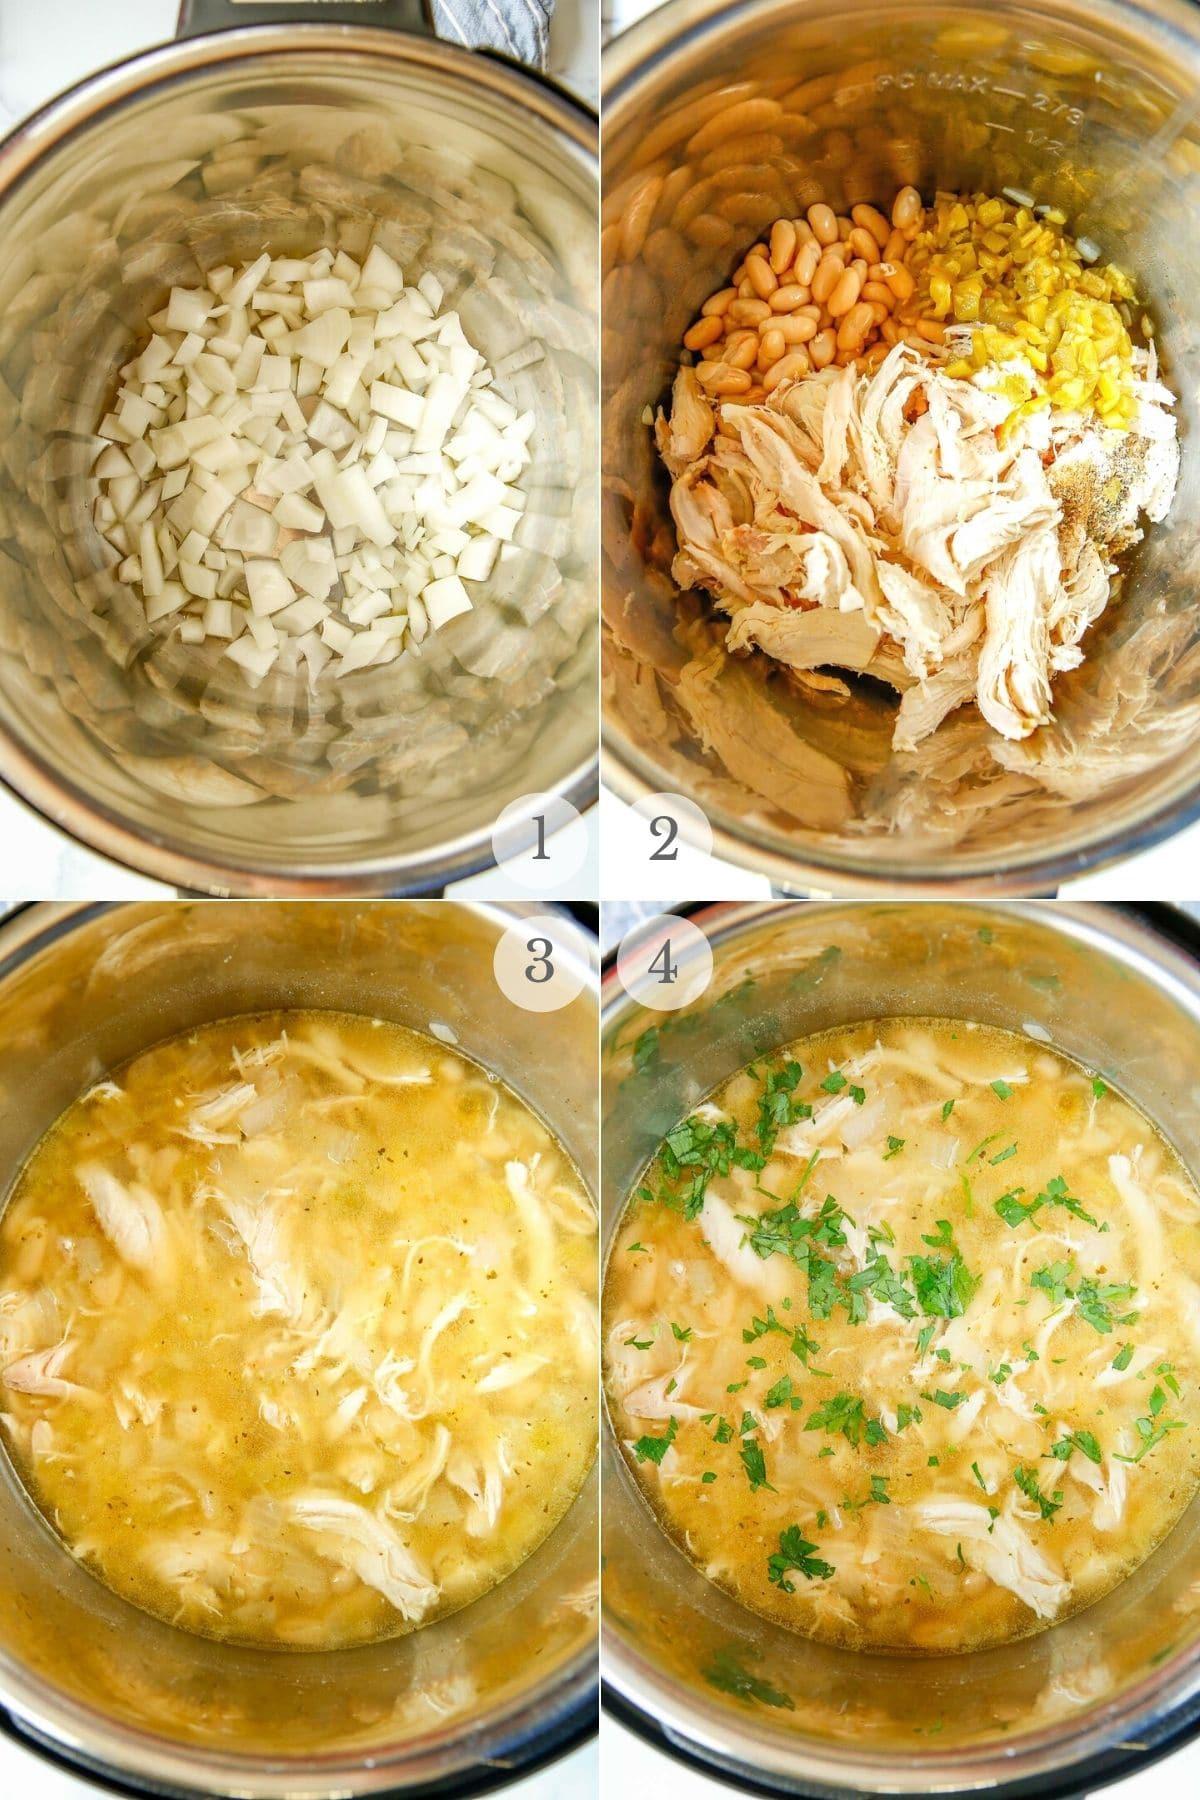 instant pot turkey chili recipe steps 1-4